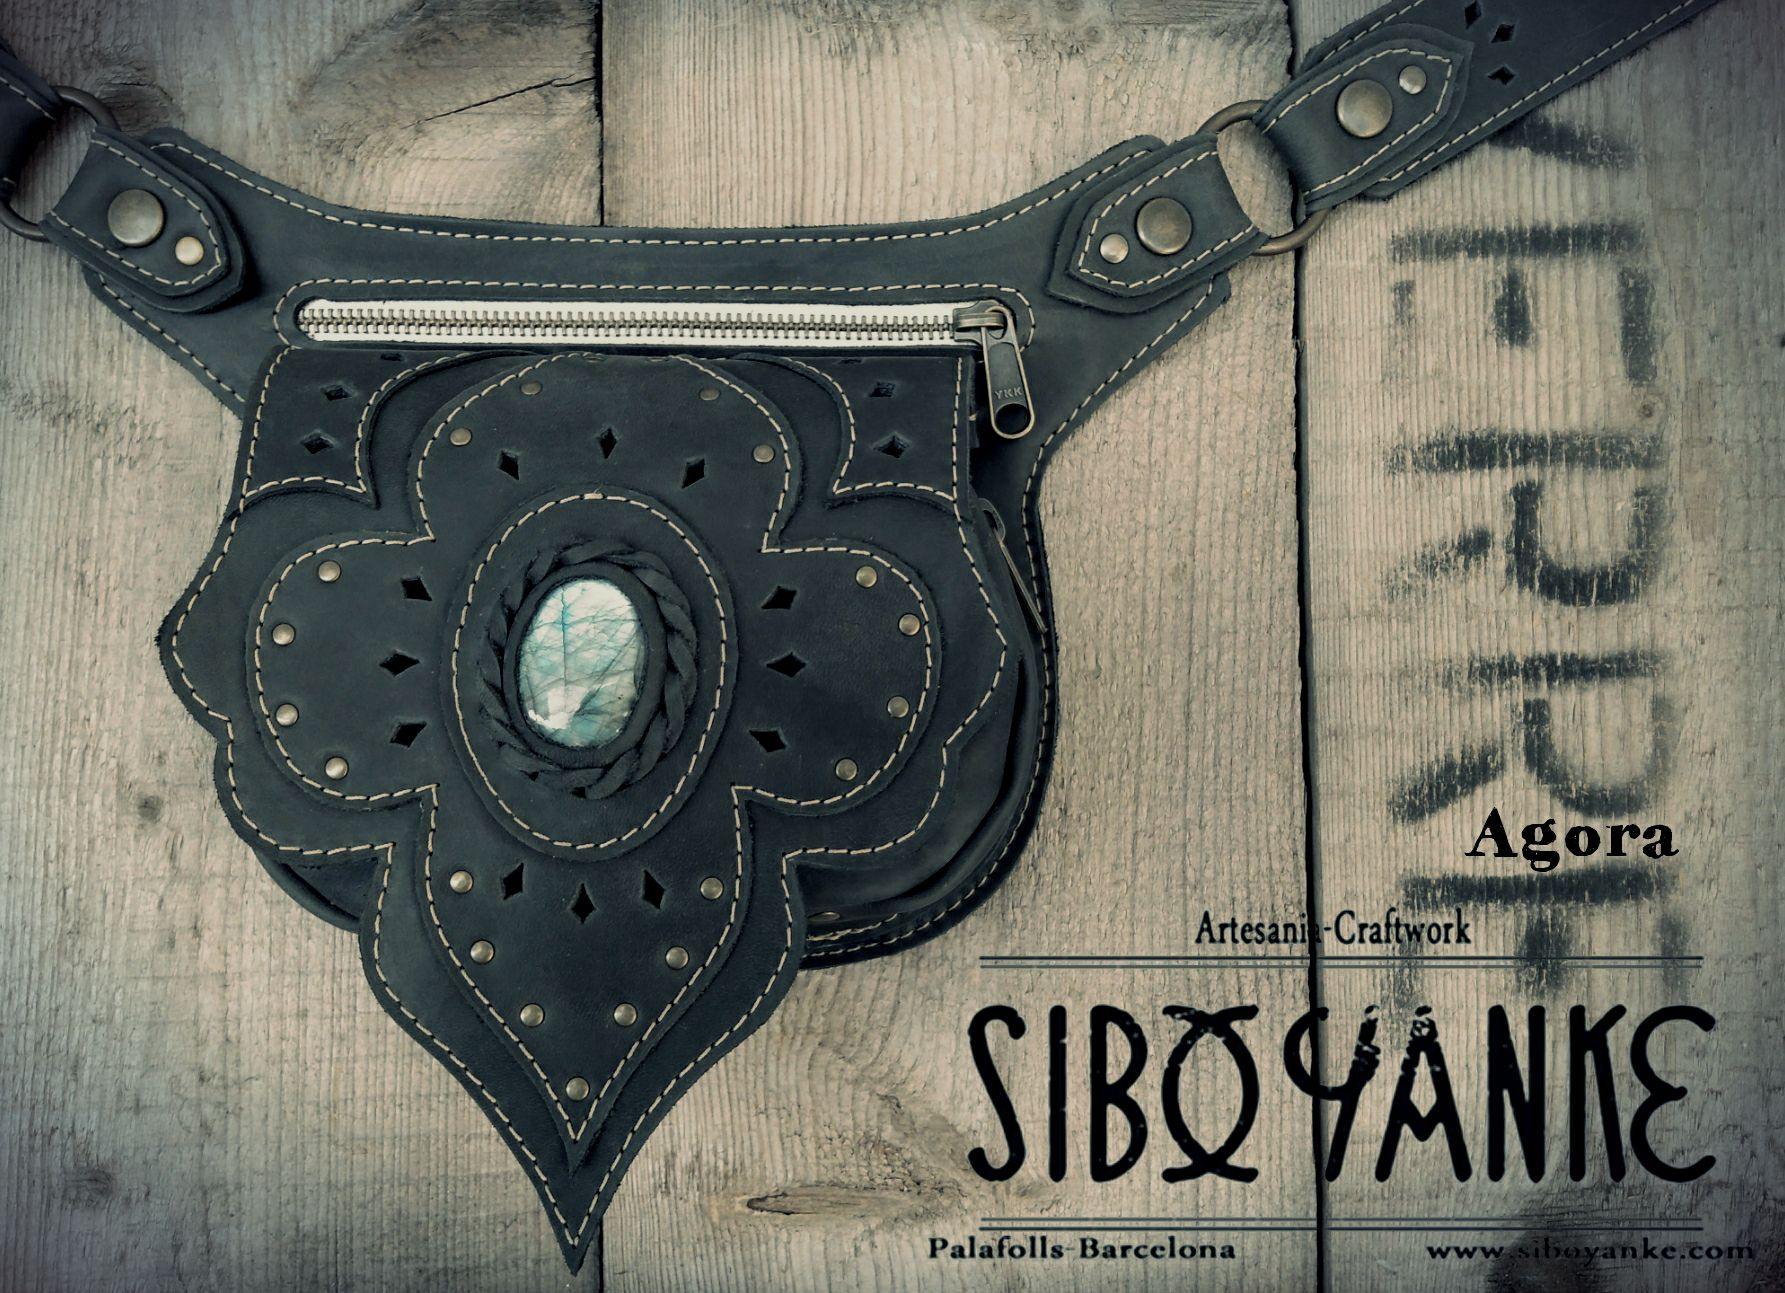 Leather Utility Belt + Festival Belt + Labradorite+Gemstones+Sibo yanke (3)